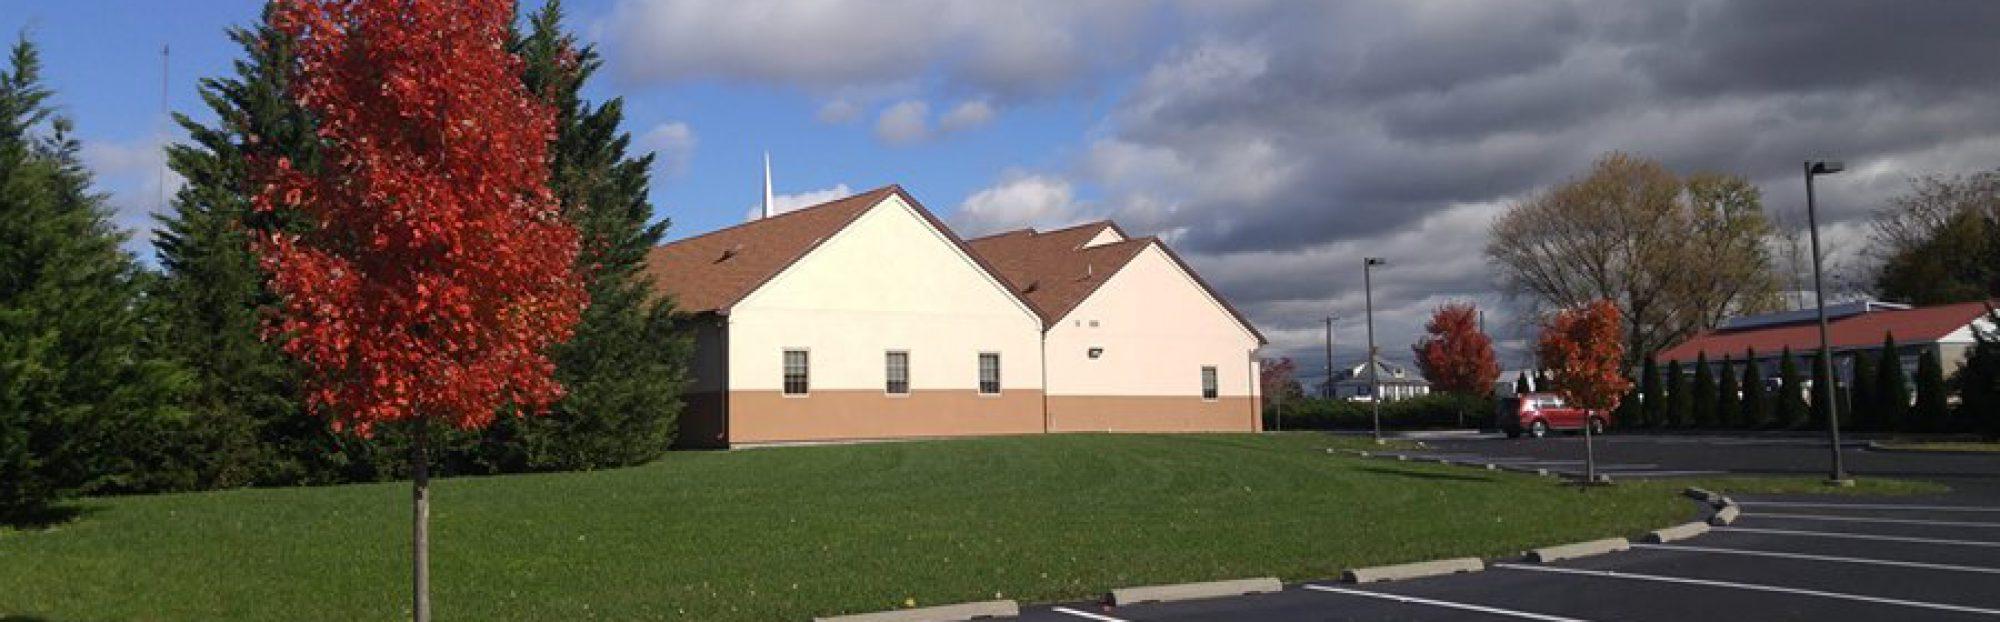 Catoctin church of Christ